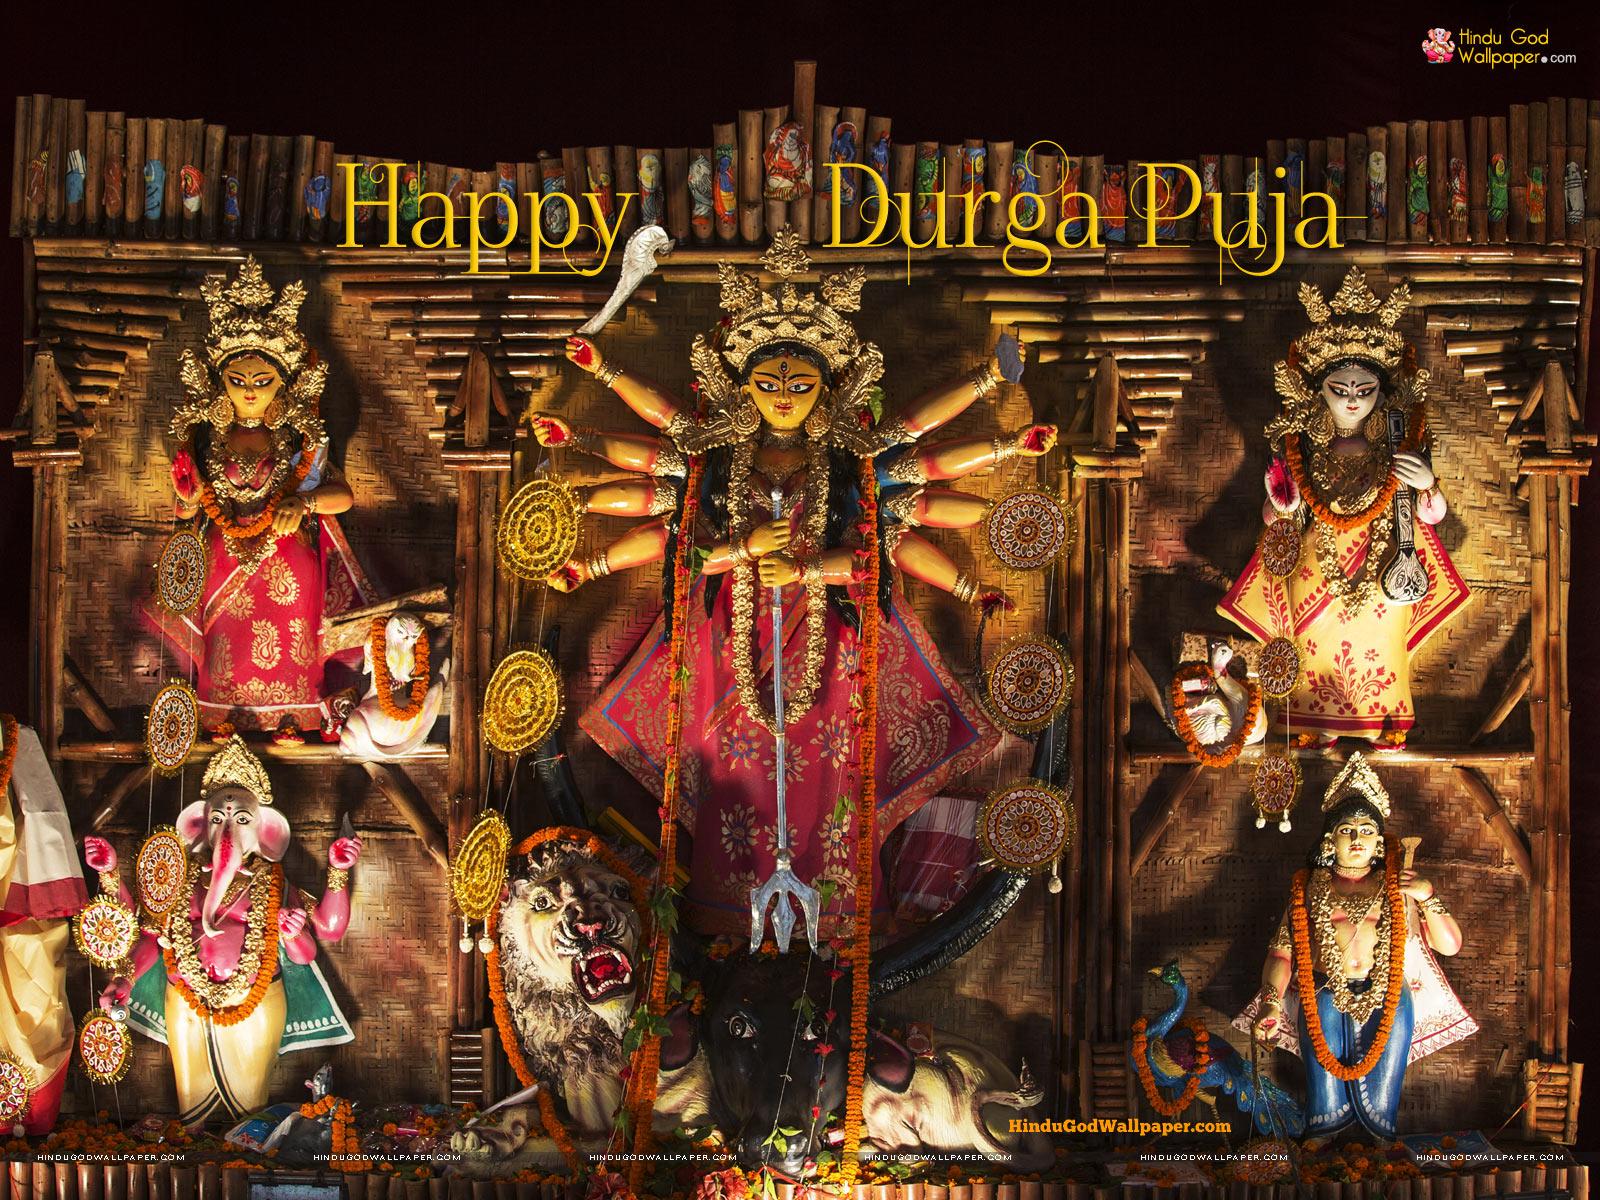 Free Hd Hindu God Wallpapers Durga Puja Wallpaper Full Size Hd Free Download